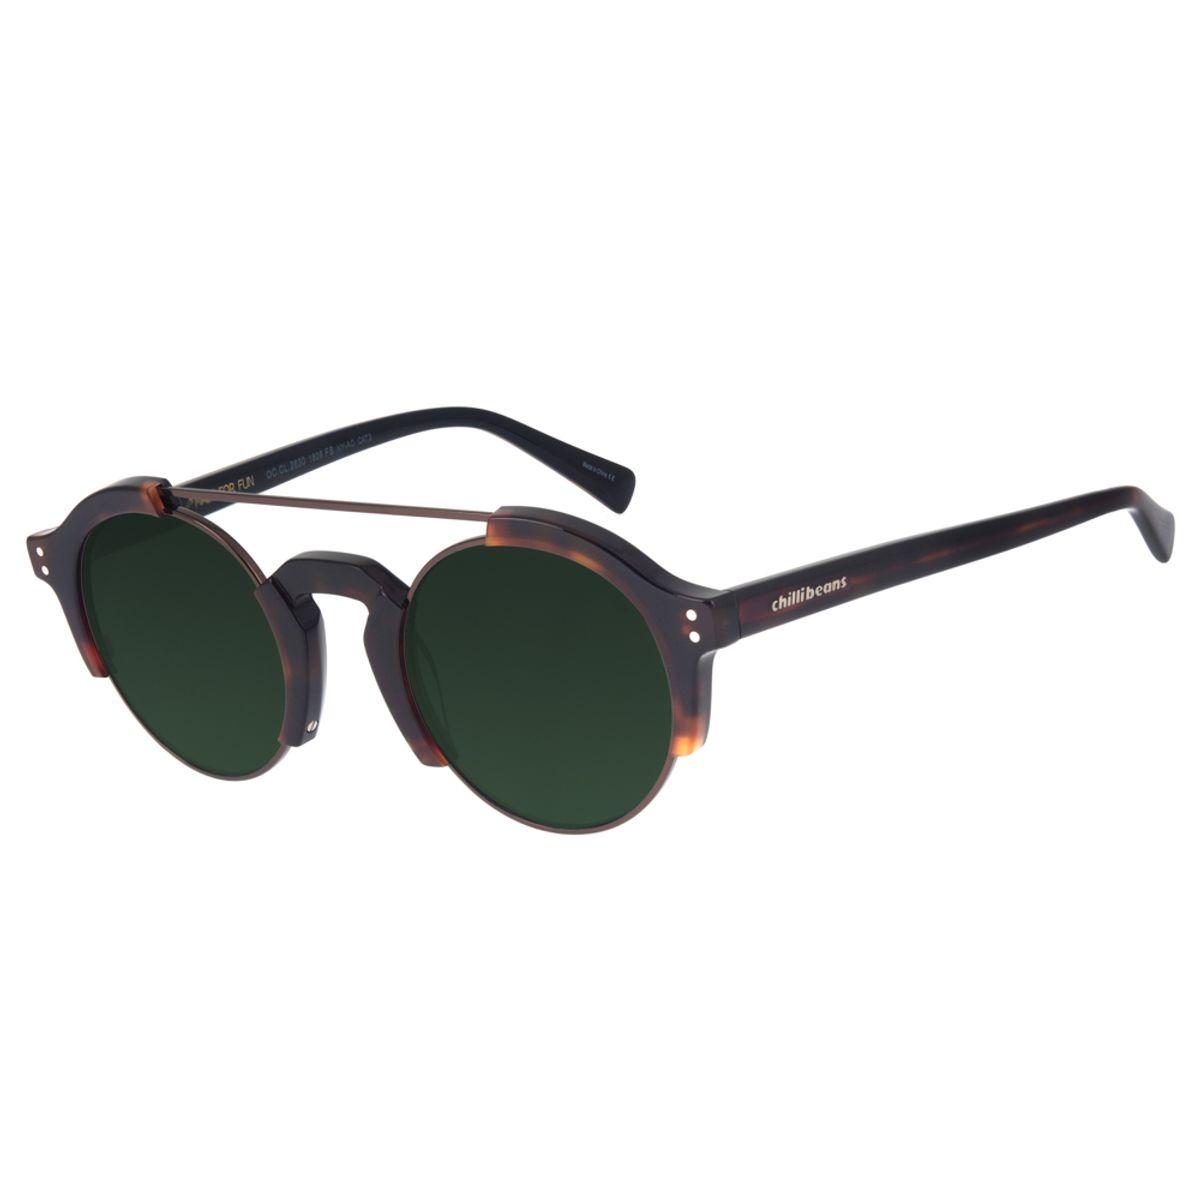 688aaf856 Óculos de Sol Chilli Beans Unissex Steampunk Tartaruga 2630 - Chilli ...